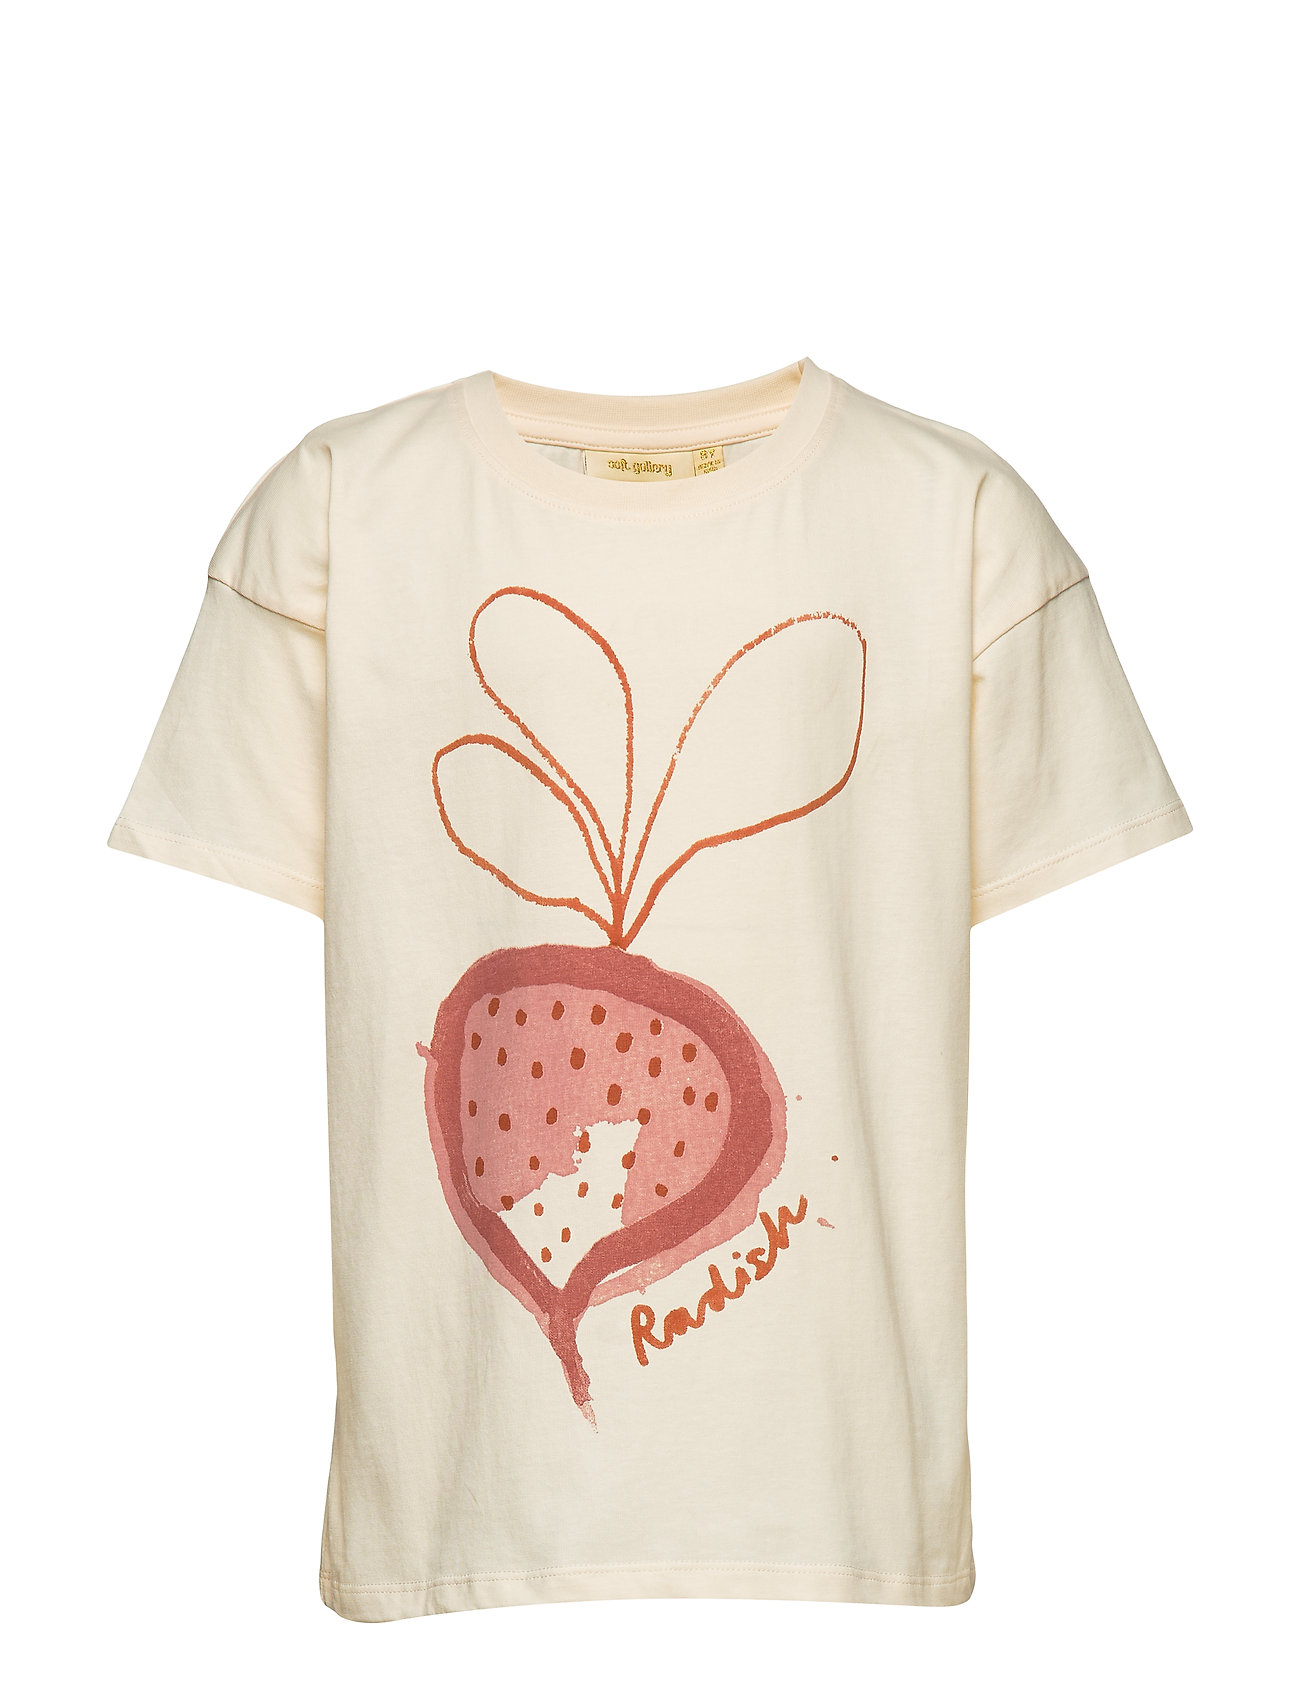 Soft Gallery Dharma T-shirt - GARDENIA, RADISH